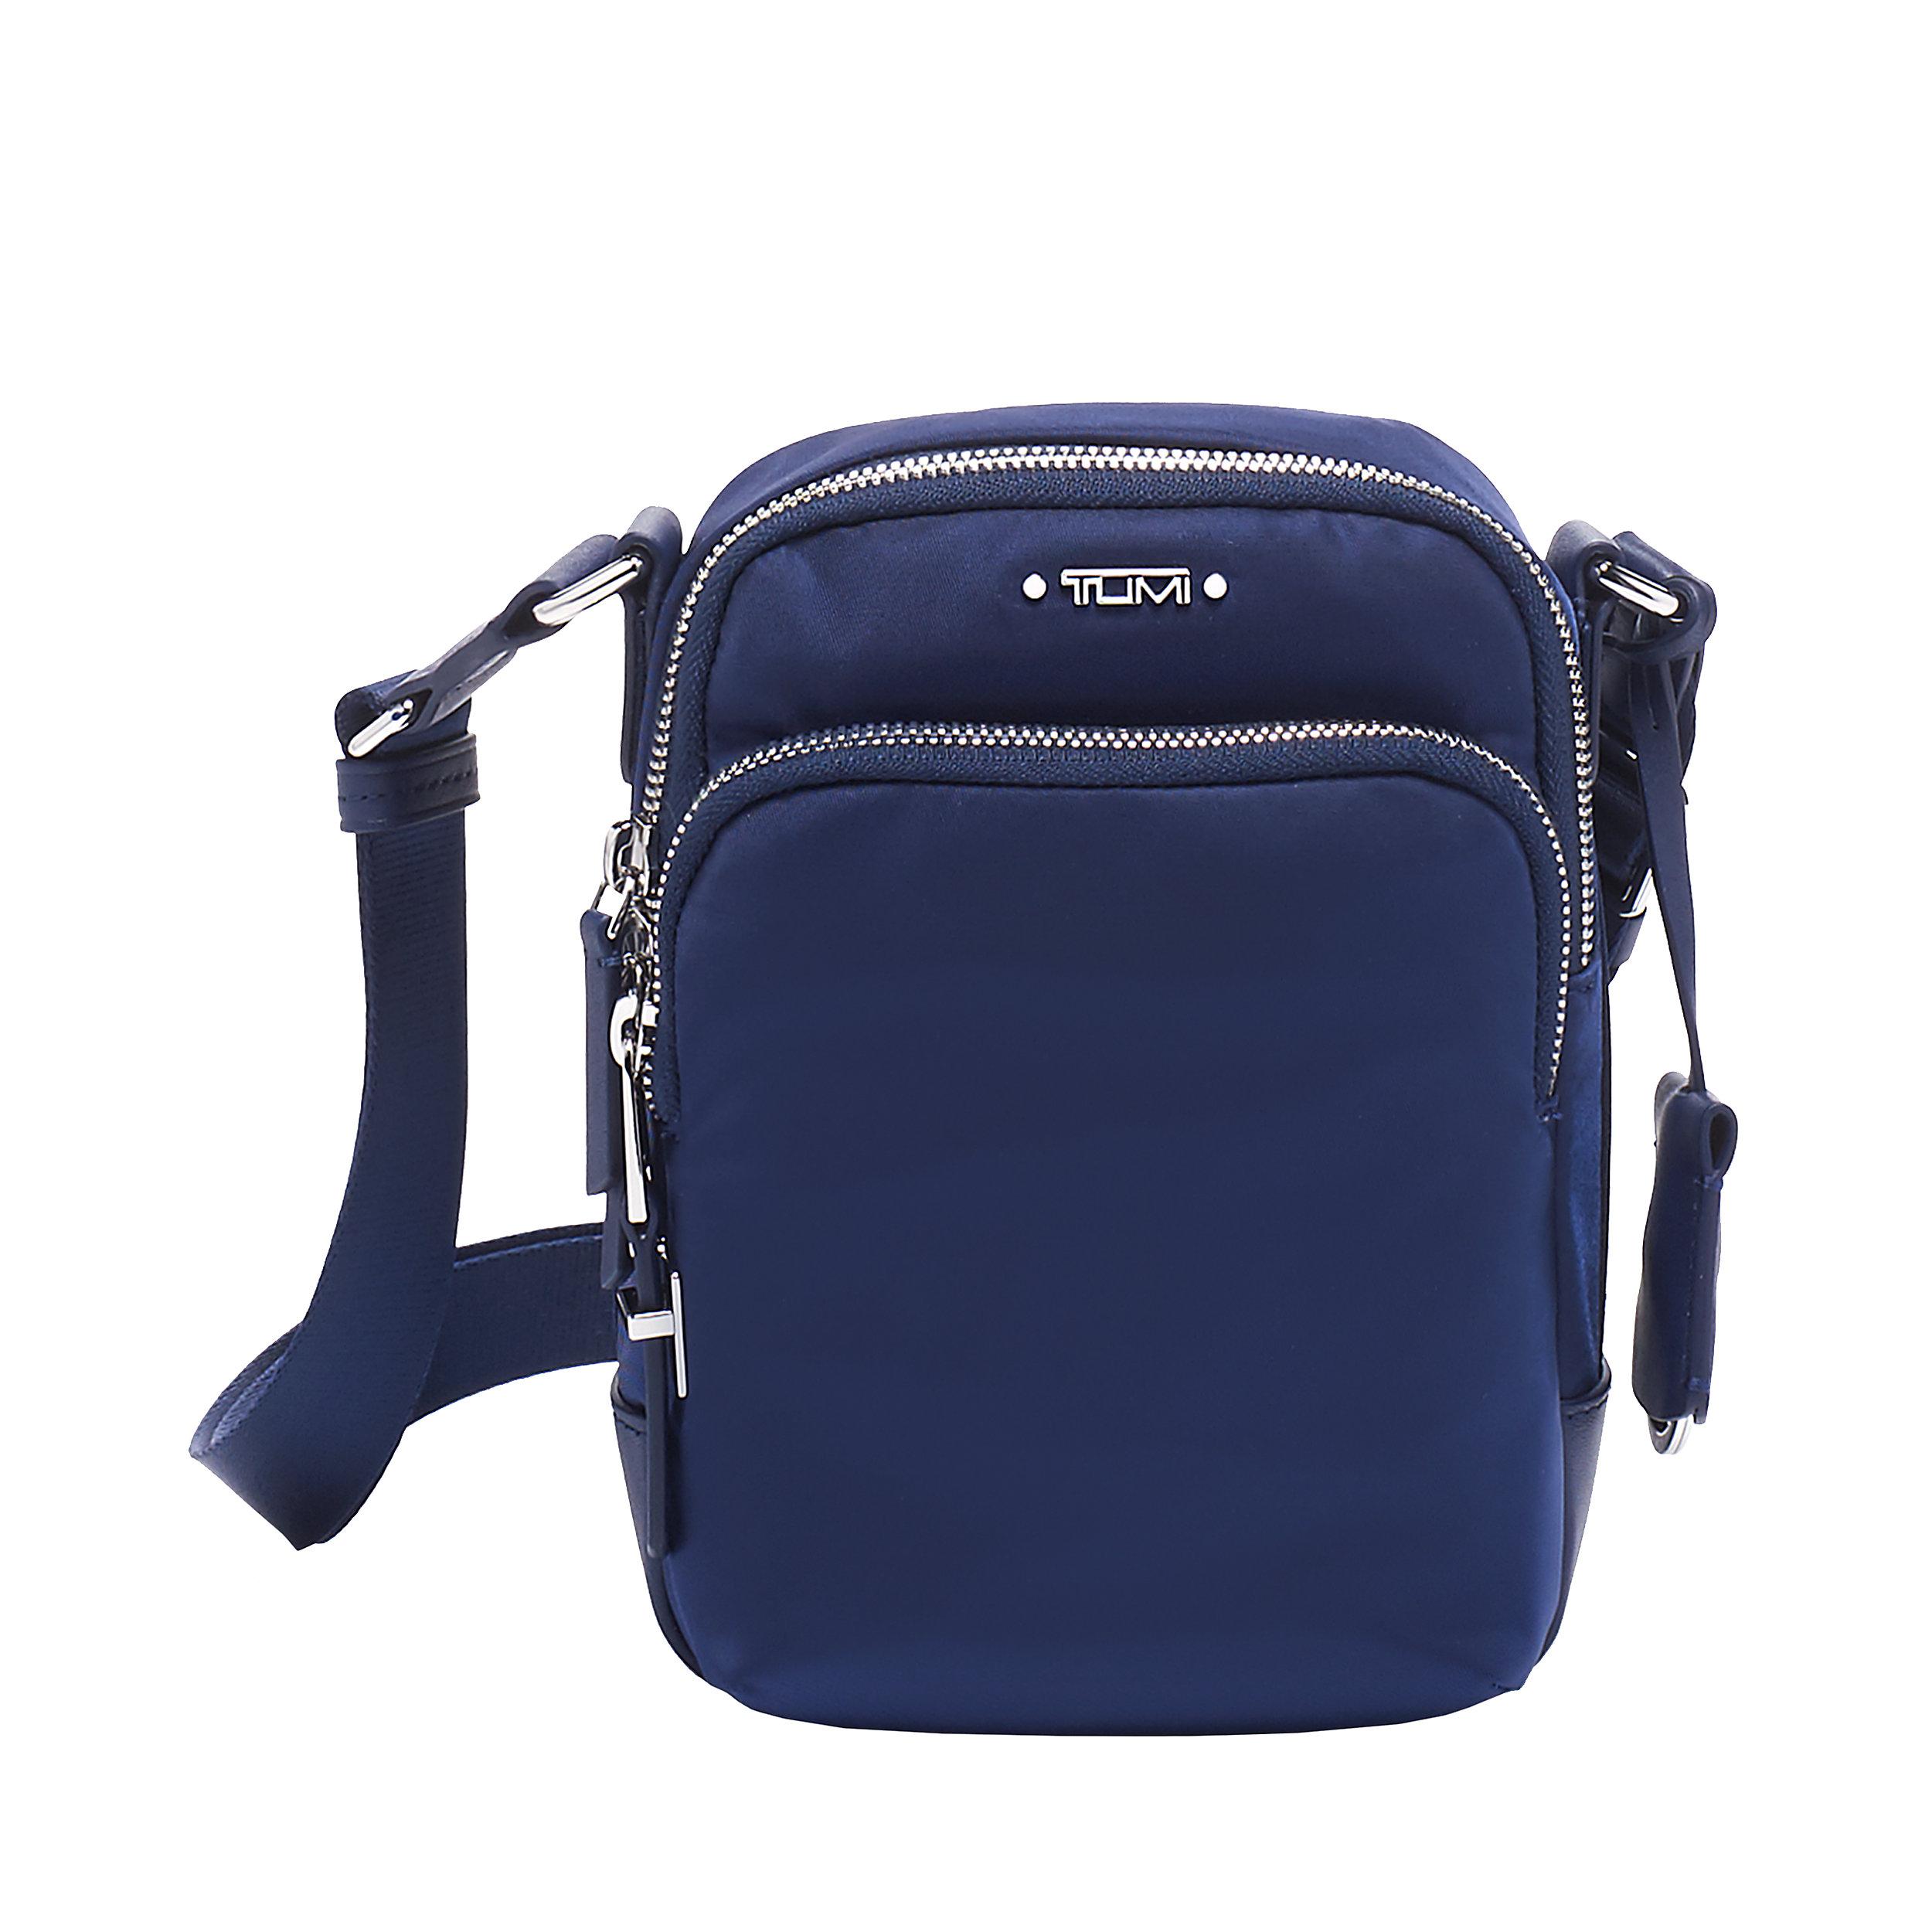 Crossbody Bag Ruma Voyageur 1.3 Liter